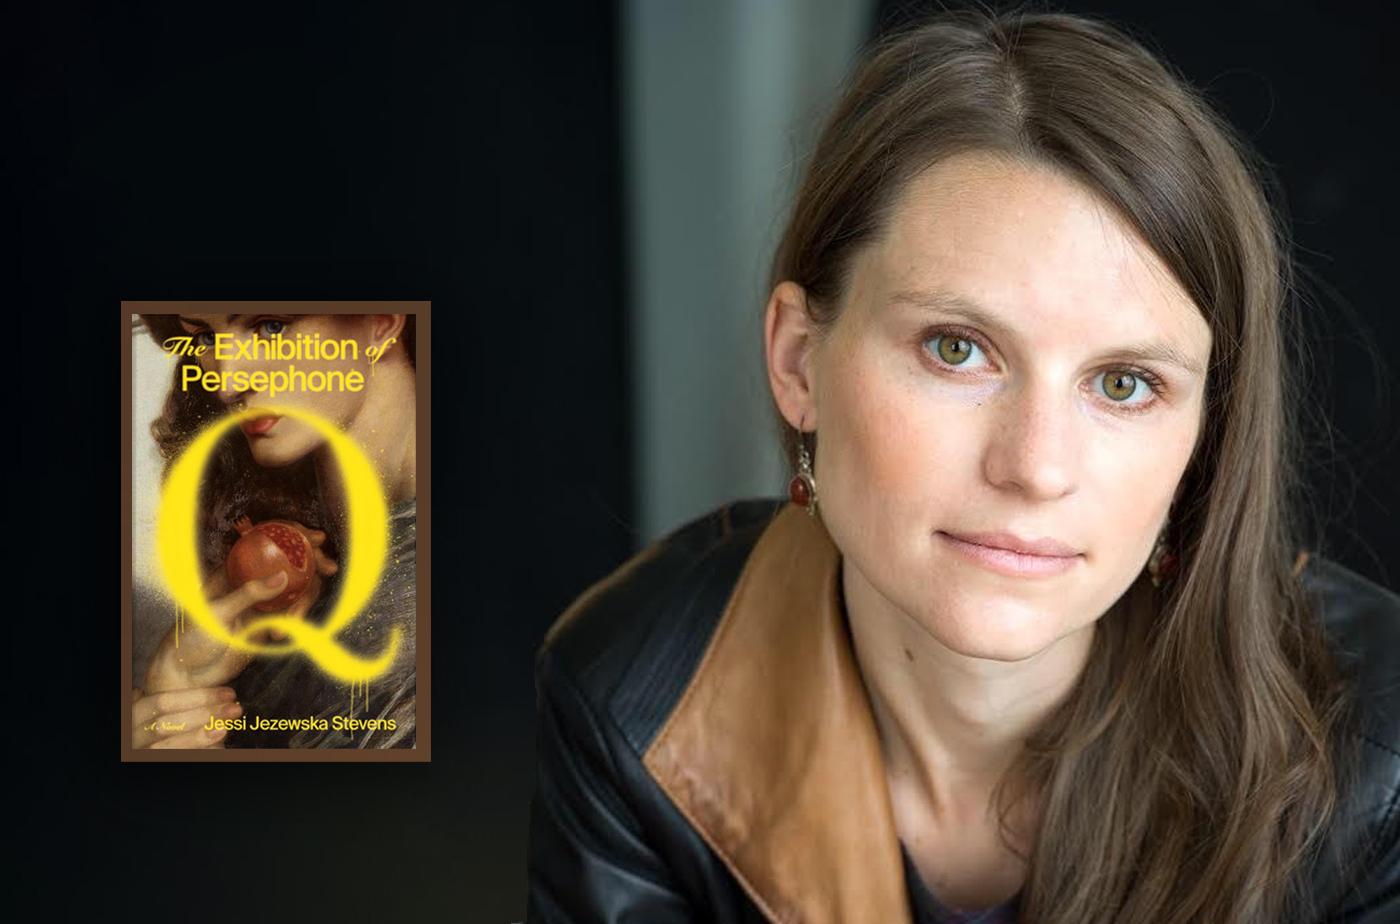 Catapult online classes: Jessi Jezewska Stevens, 6-Week Online Fiction Workshop: The Fundamentals of Fiction, Fiction, Workshop